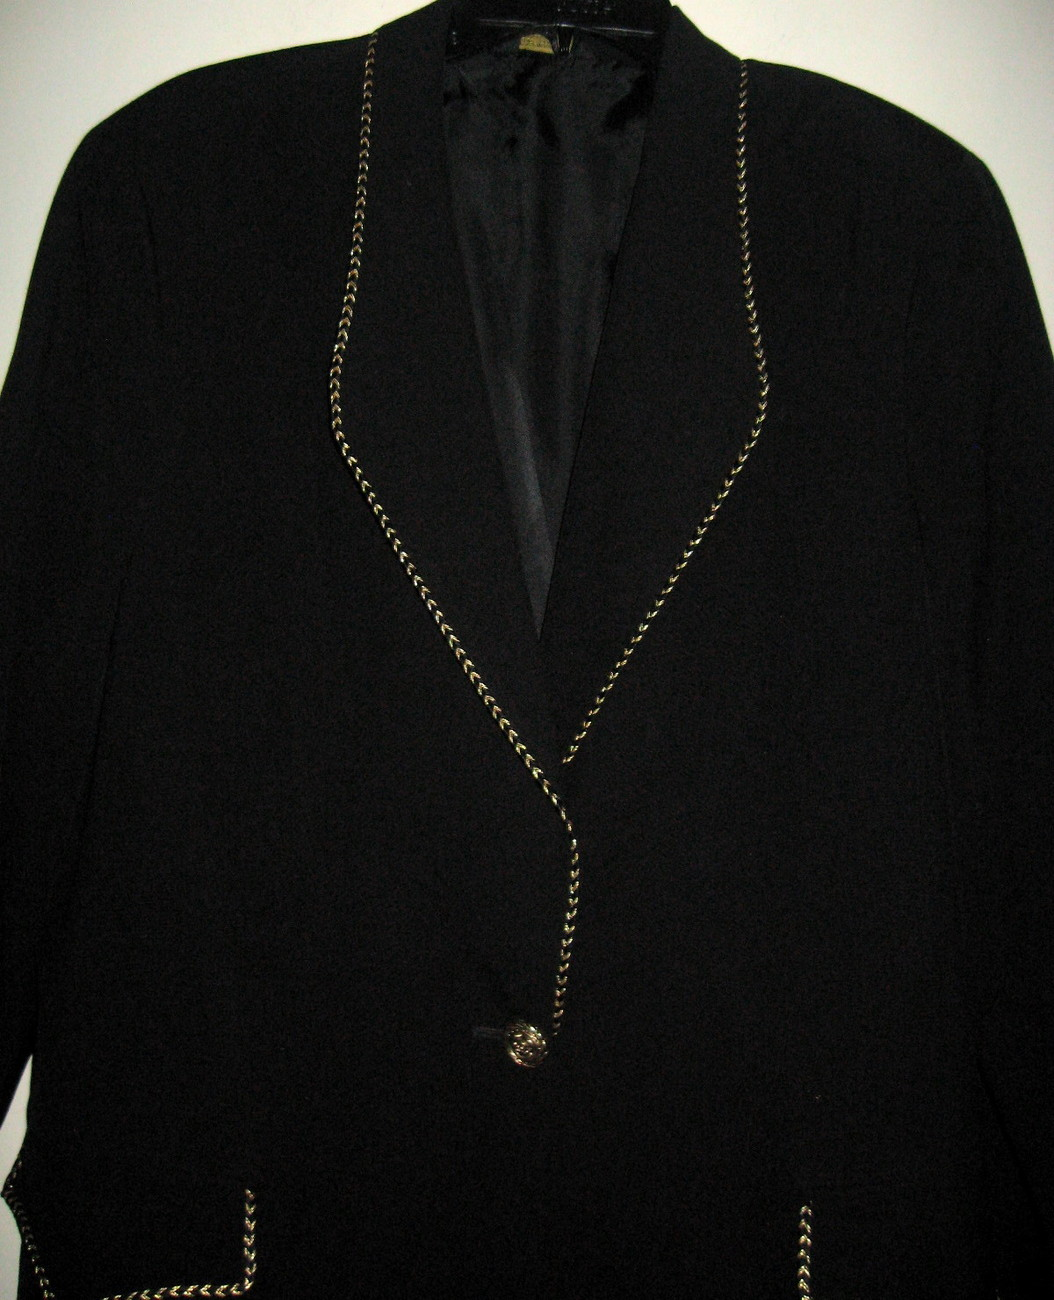 Custom Made Gorgeous Women's Black Blazer with Gold Buttons & Fancy Trim sz 16T